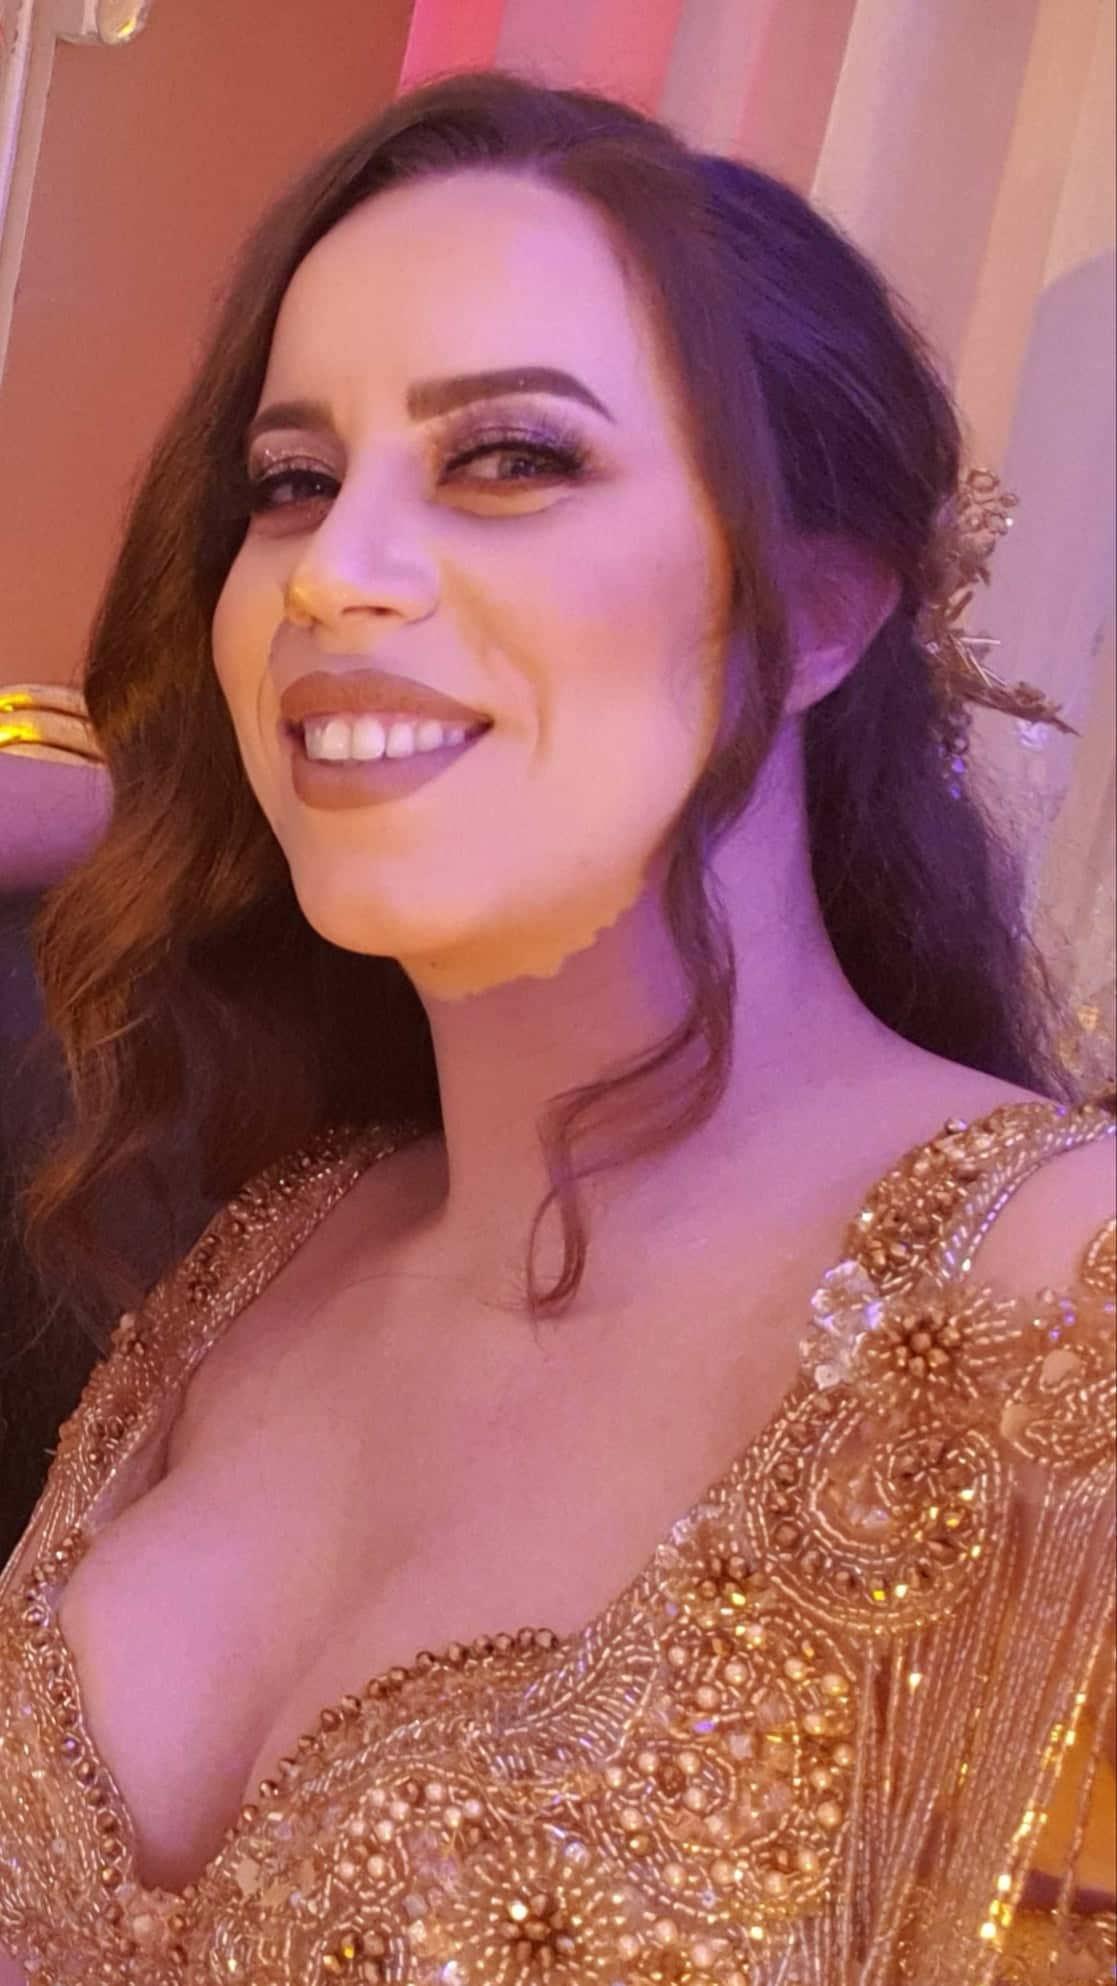 Emna_at7_plus_belles_mariées_tunisiennes2019